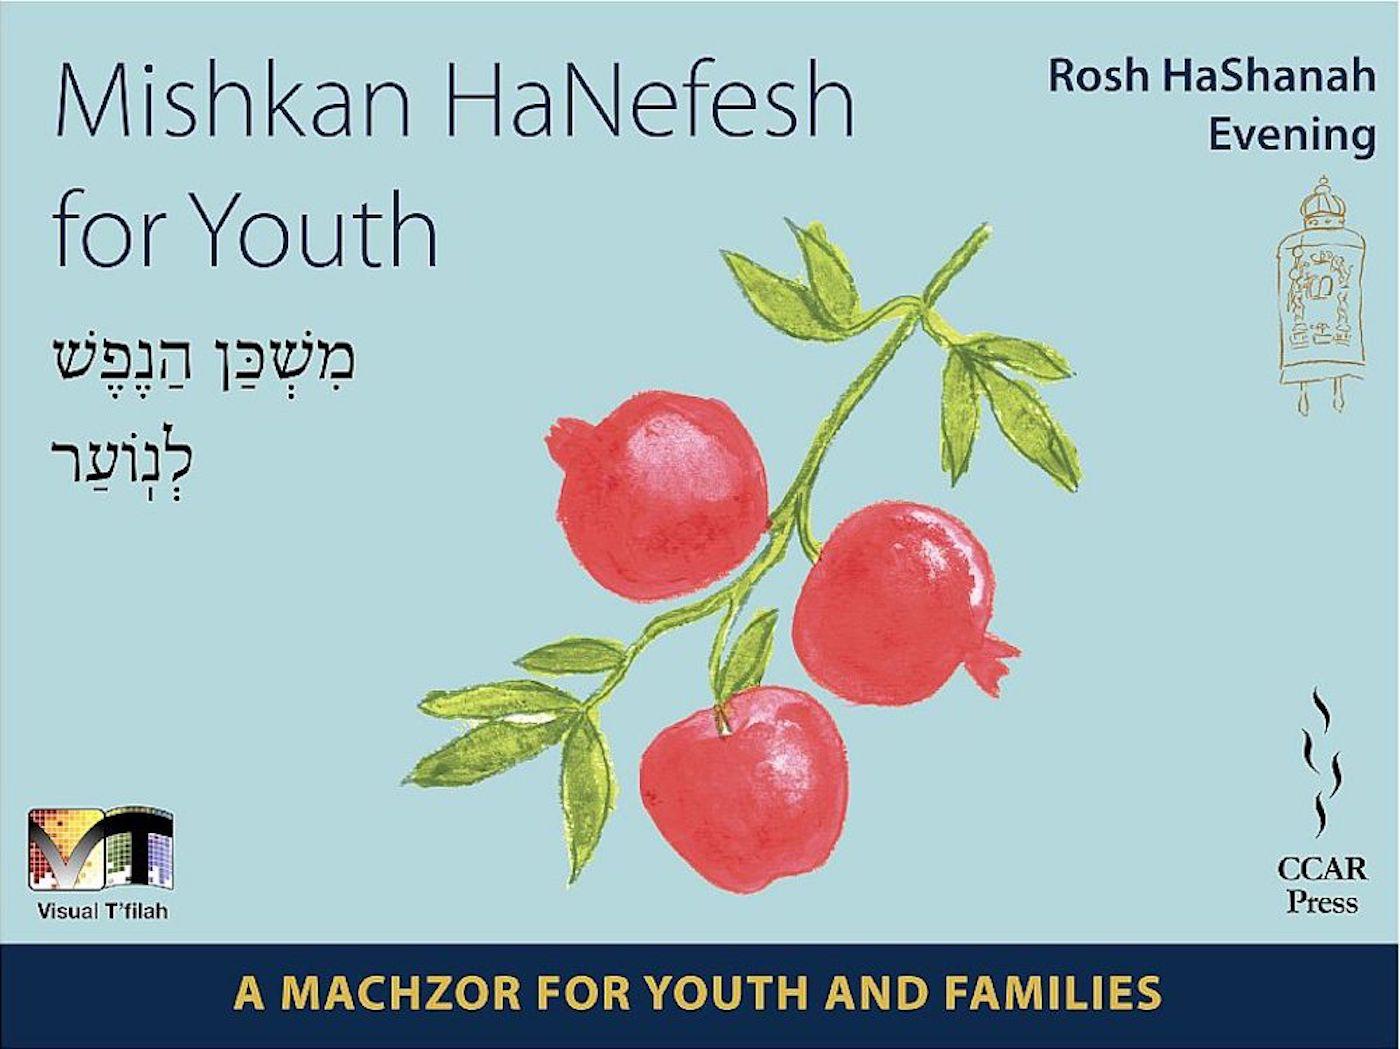 Mishkan HaNefesh for Youth Visual T'filah - Rosh HaShanah -